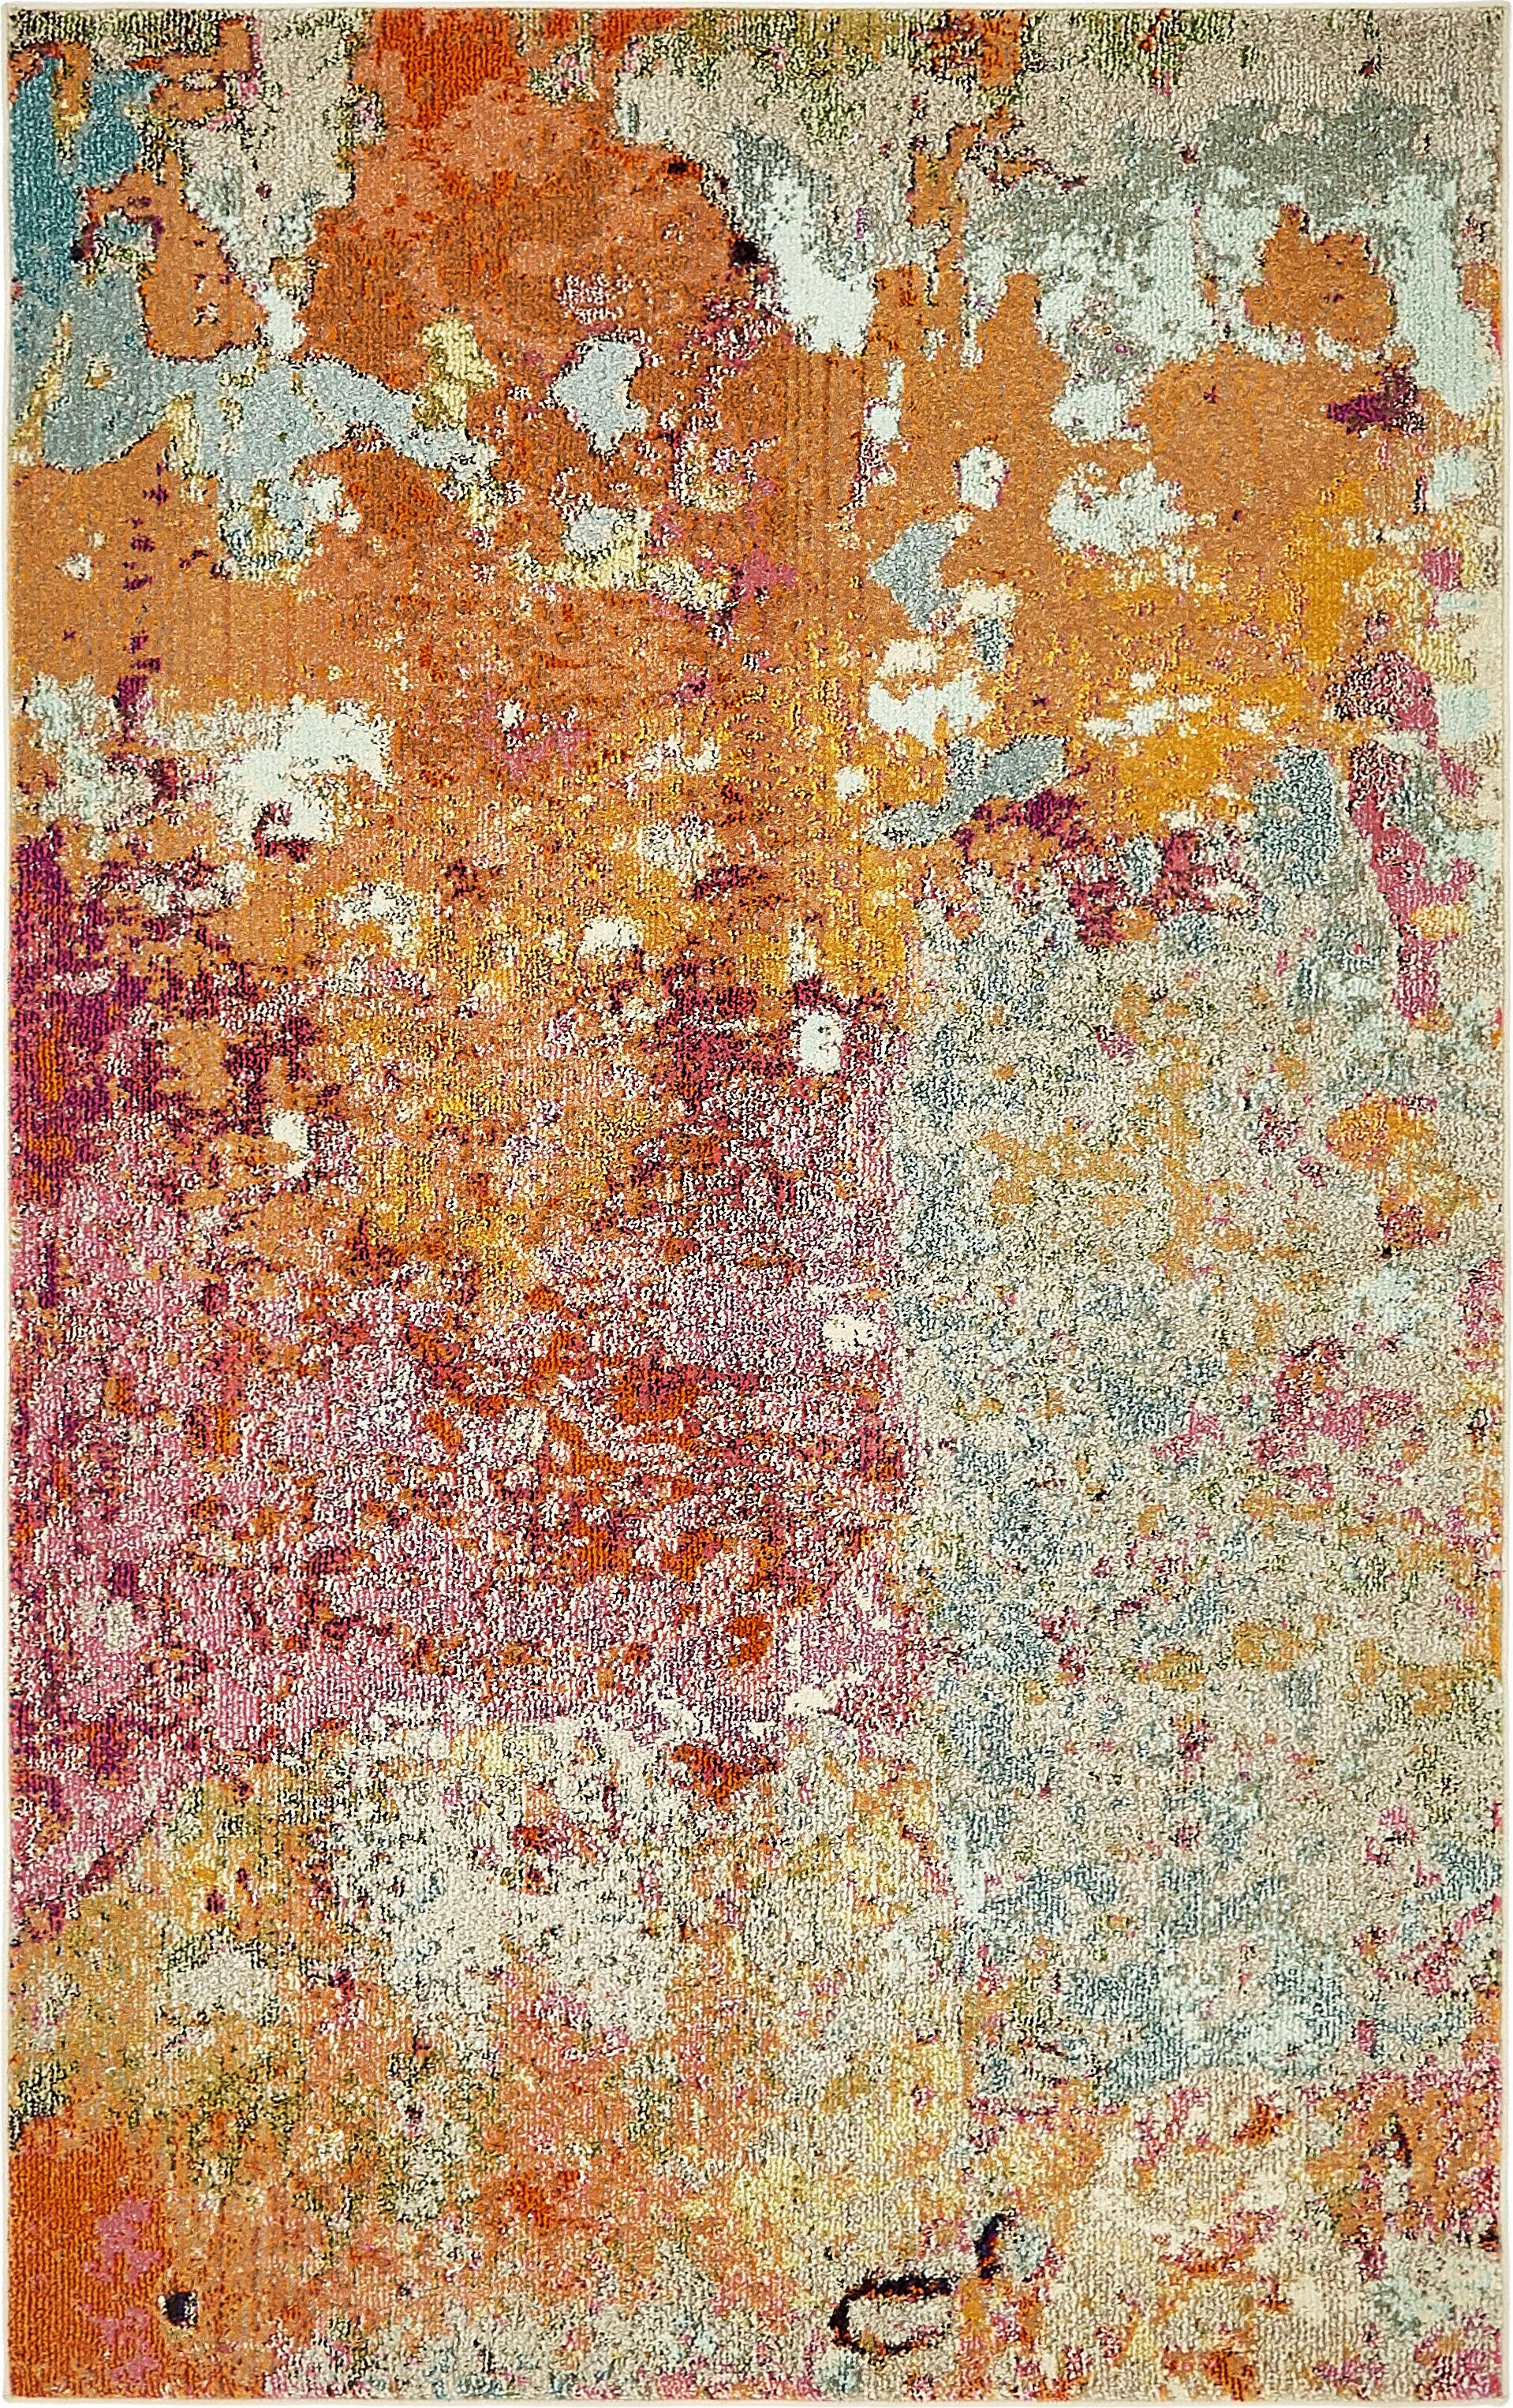 Chenango Rectangle Orange/Pink Area Rug Rug Size: Rectangle 5' x 8'